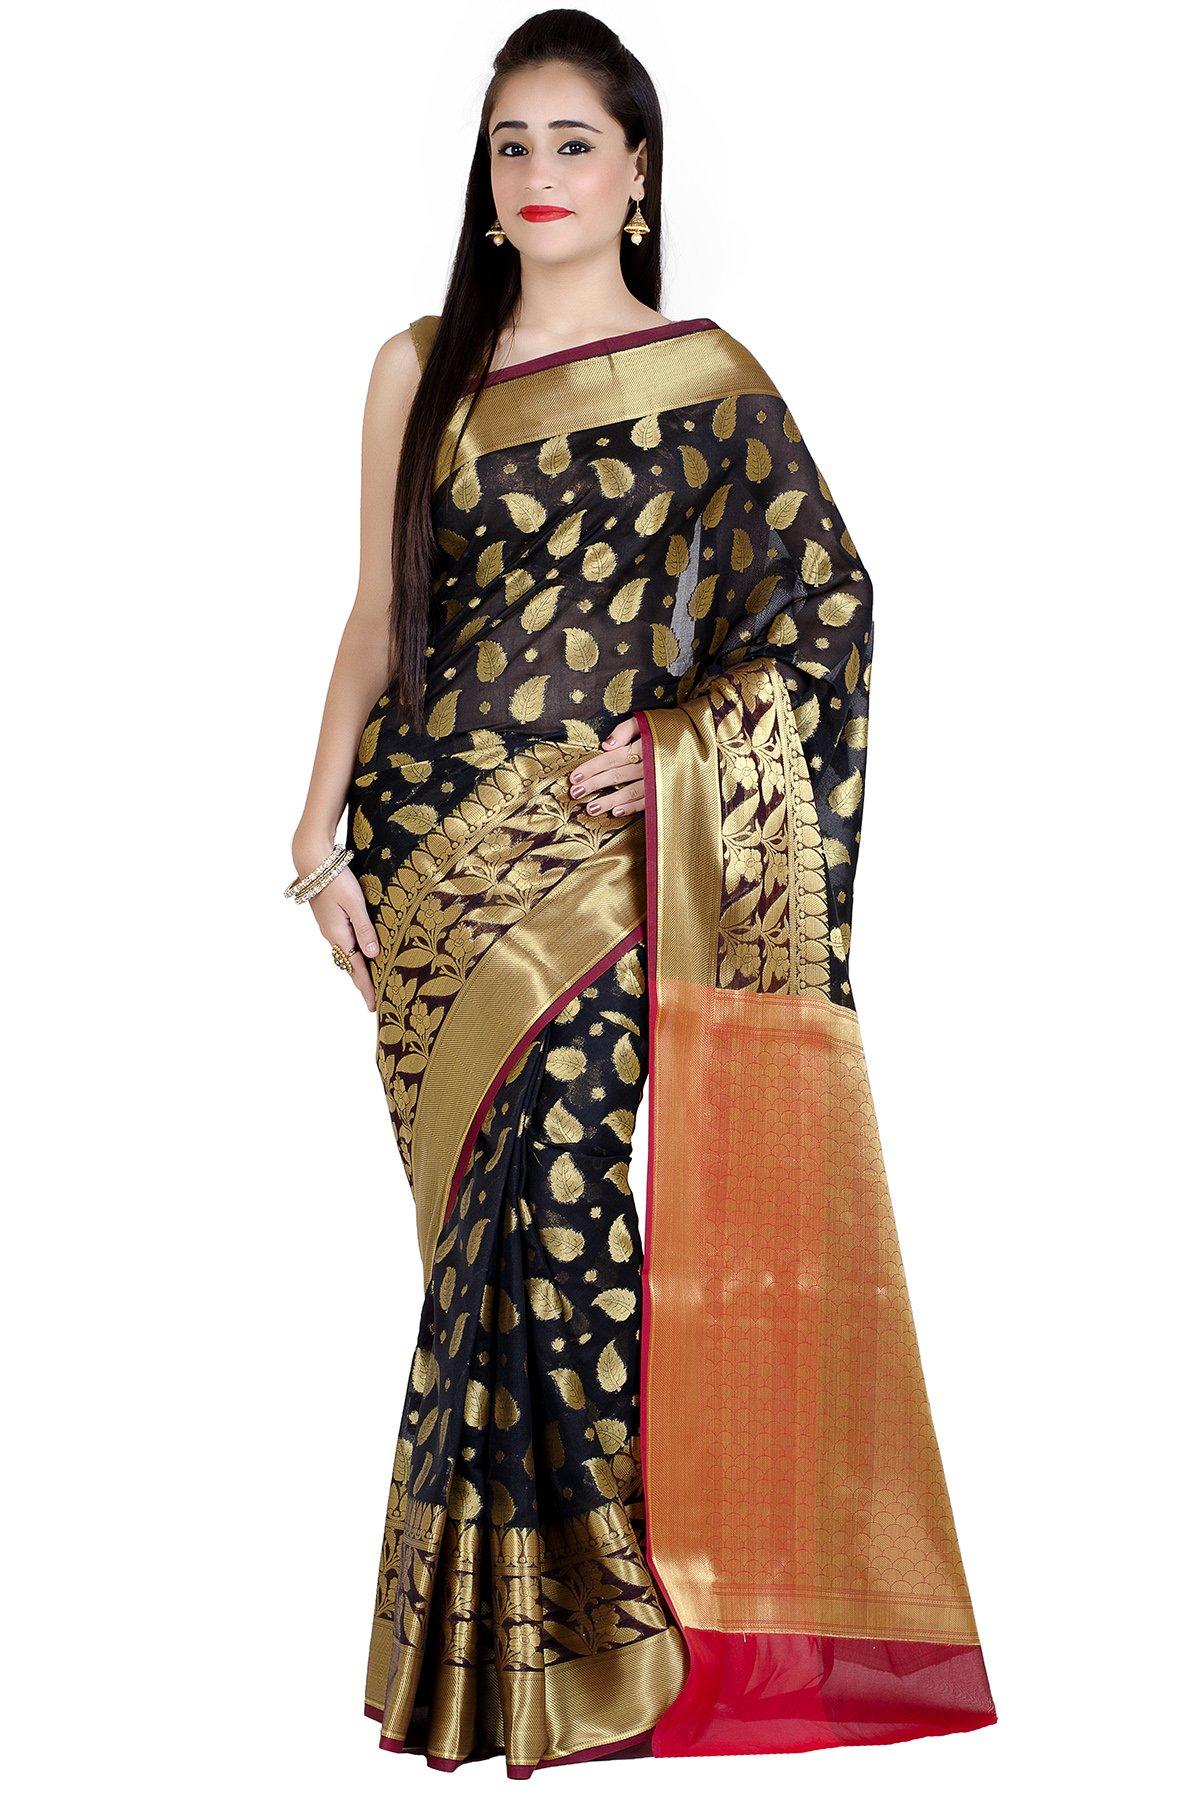 Chandrakala Women's Black Cotton Silk Banarasi Saree